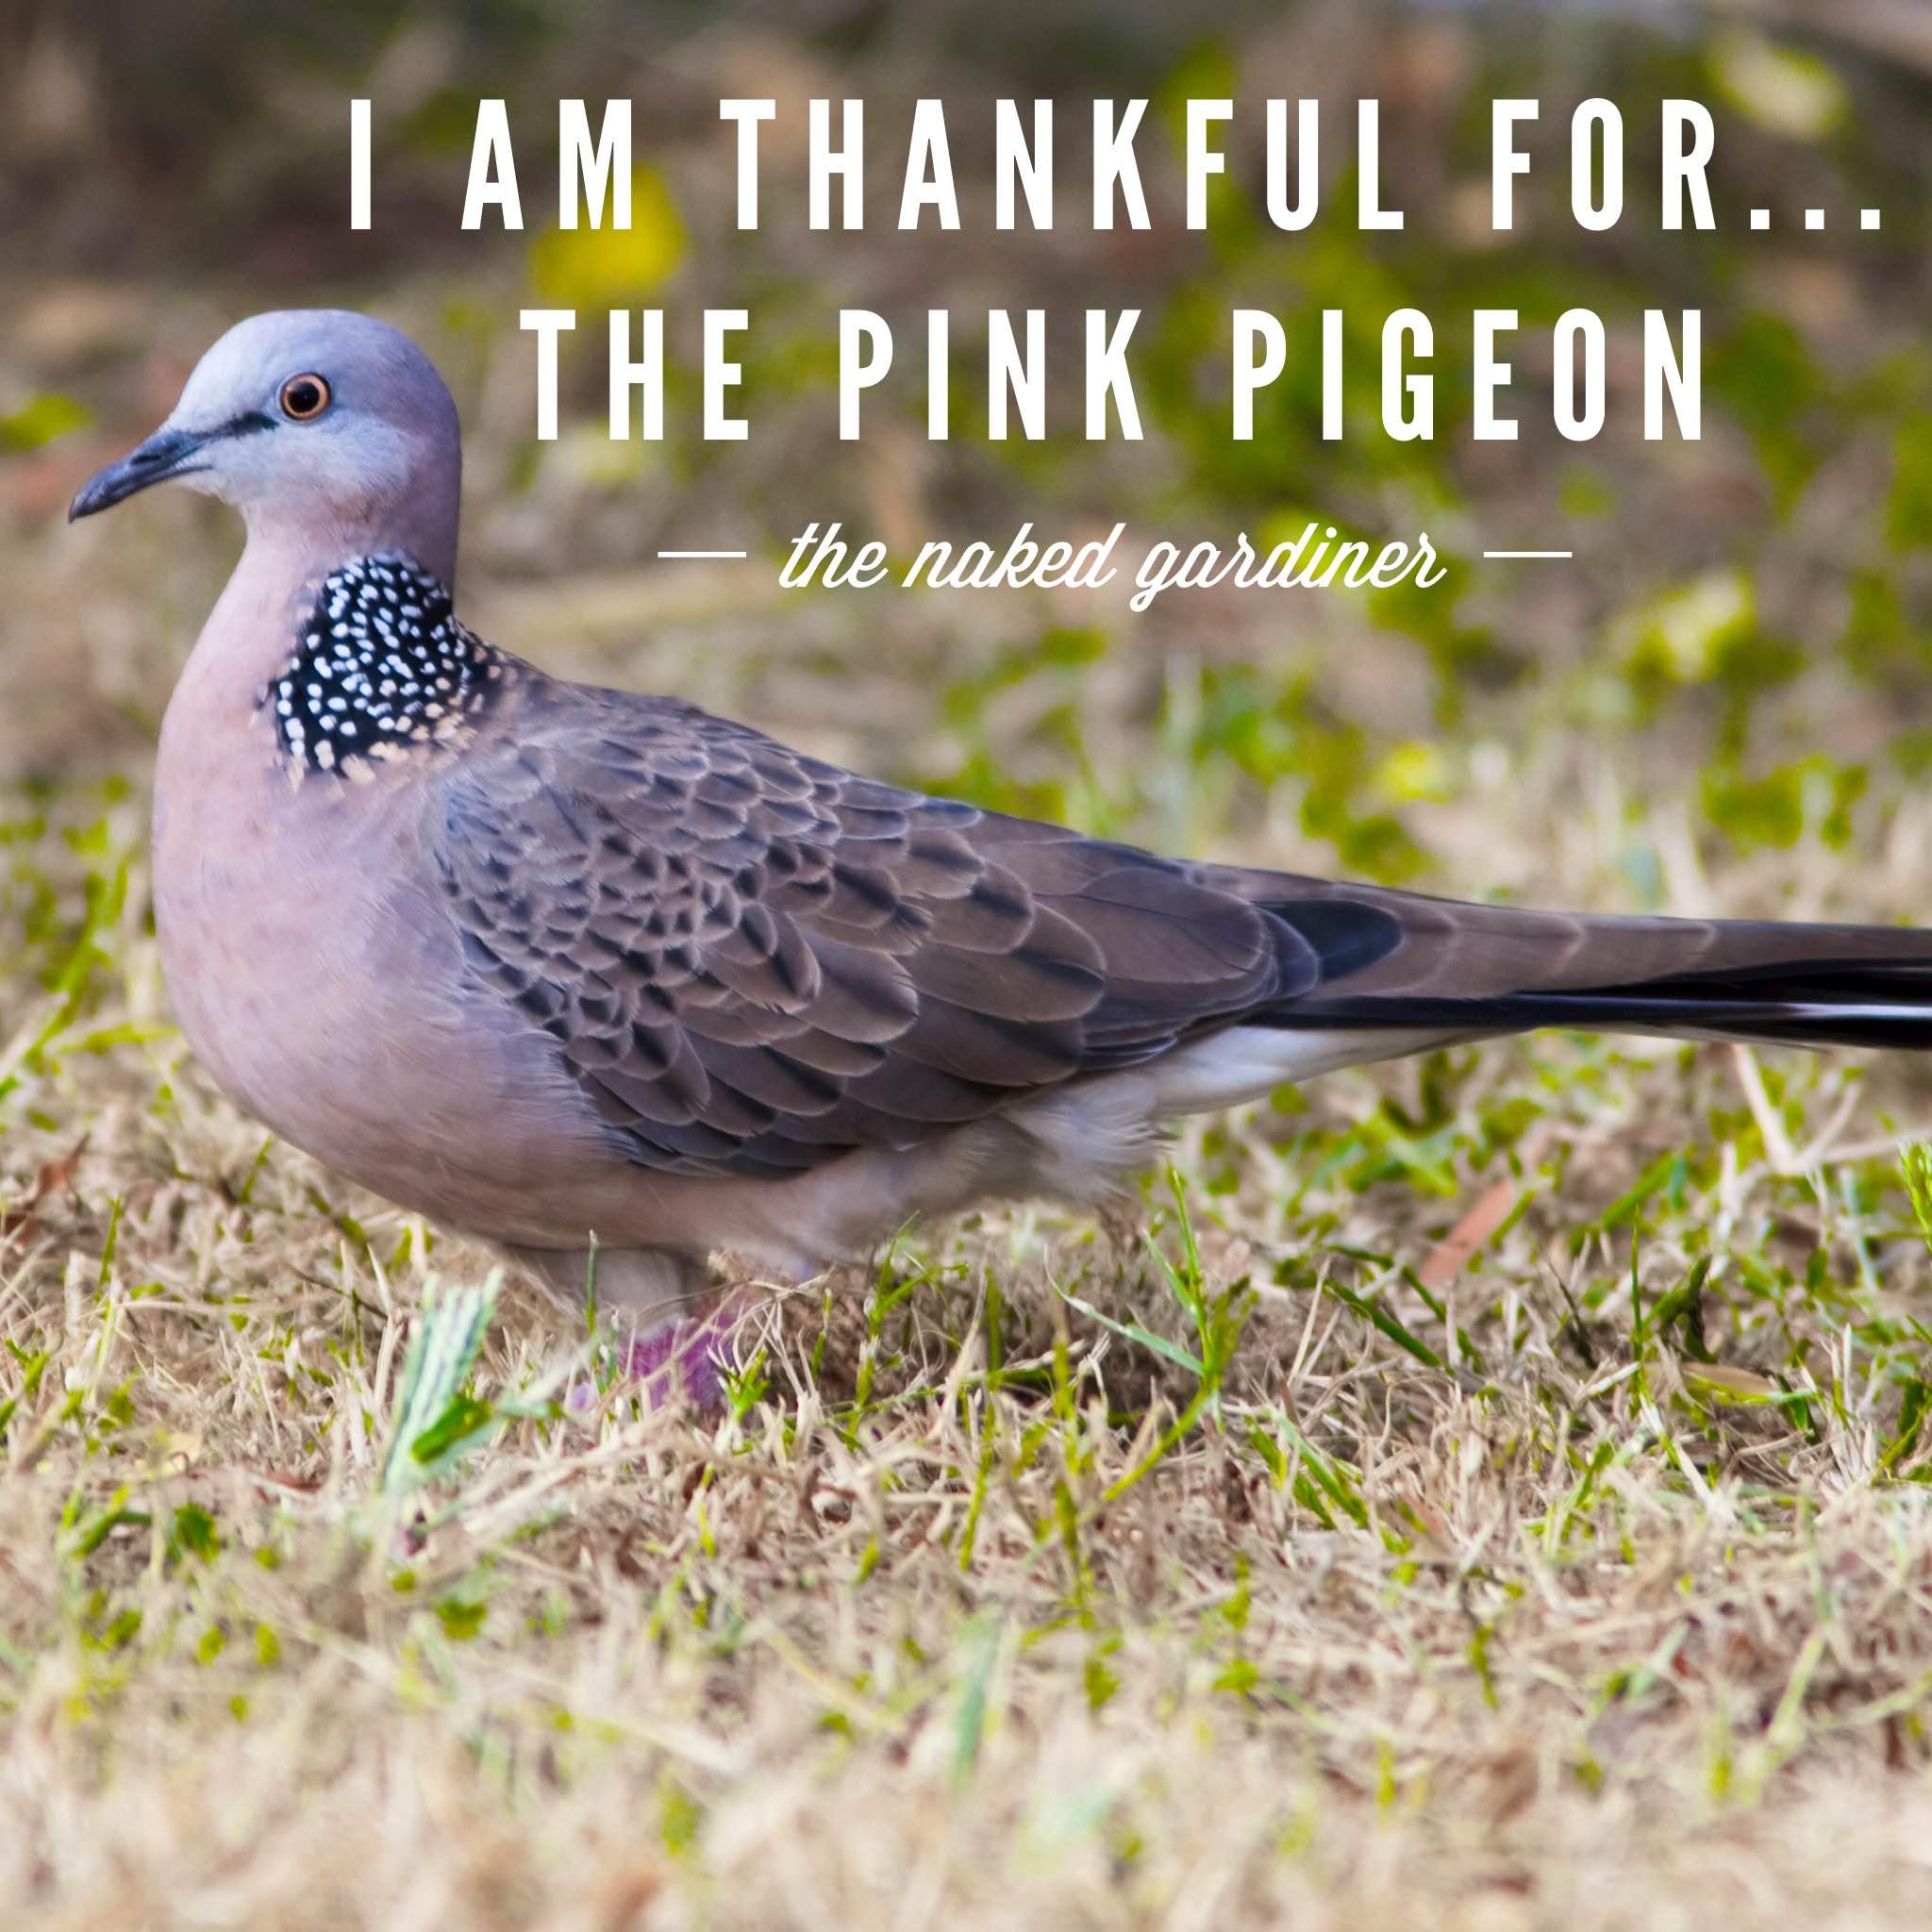 thankful-thursdays-the-pink-pigeon-thenakedgardiner